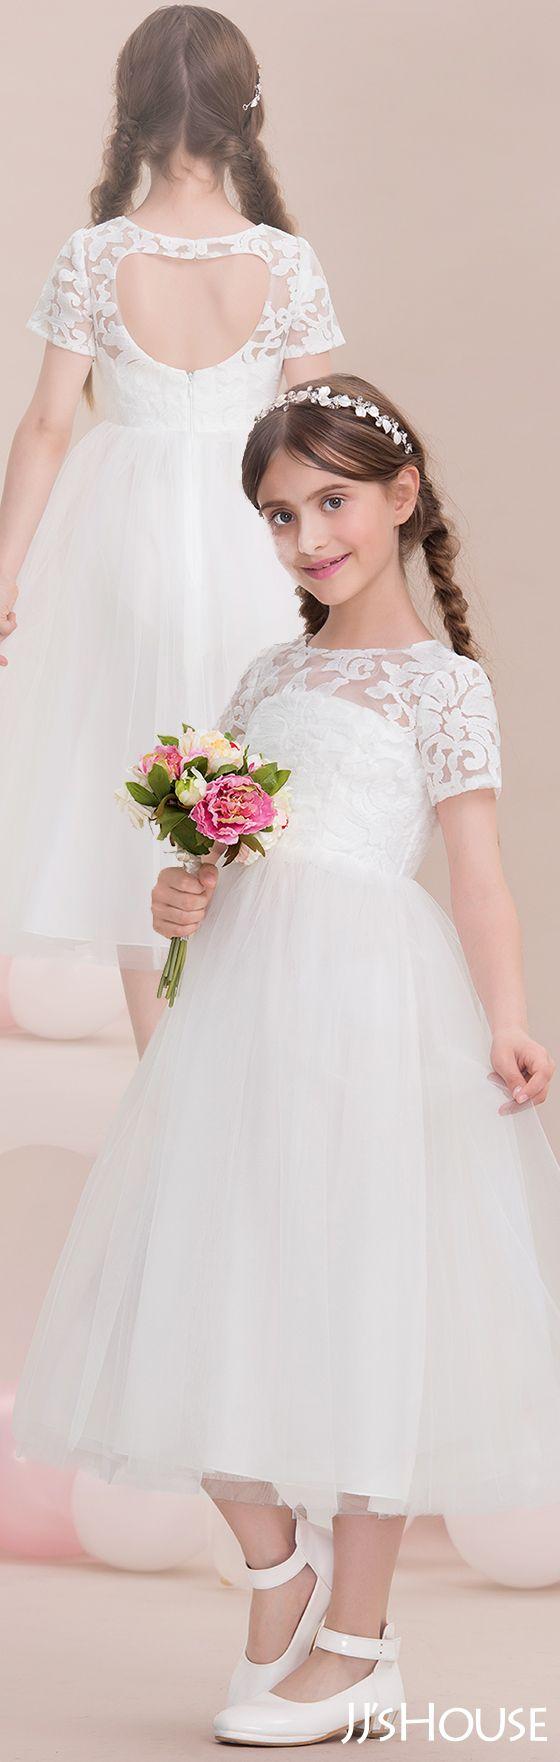 188 best junior bridesmaid dresses images on pinterest sweet girl lovely dress jjshouse junior bridesmaid ombrellifo Choice Image